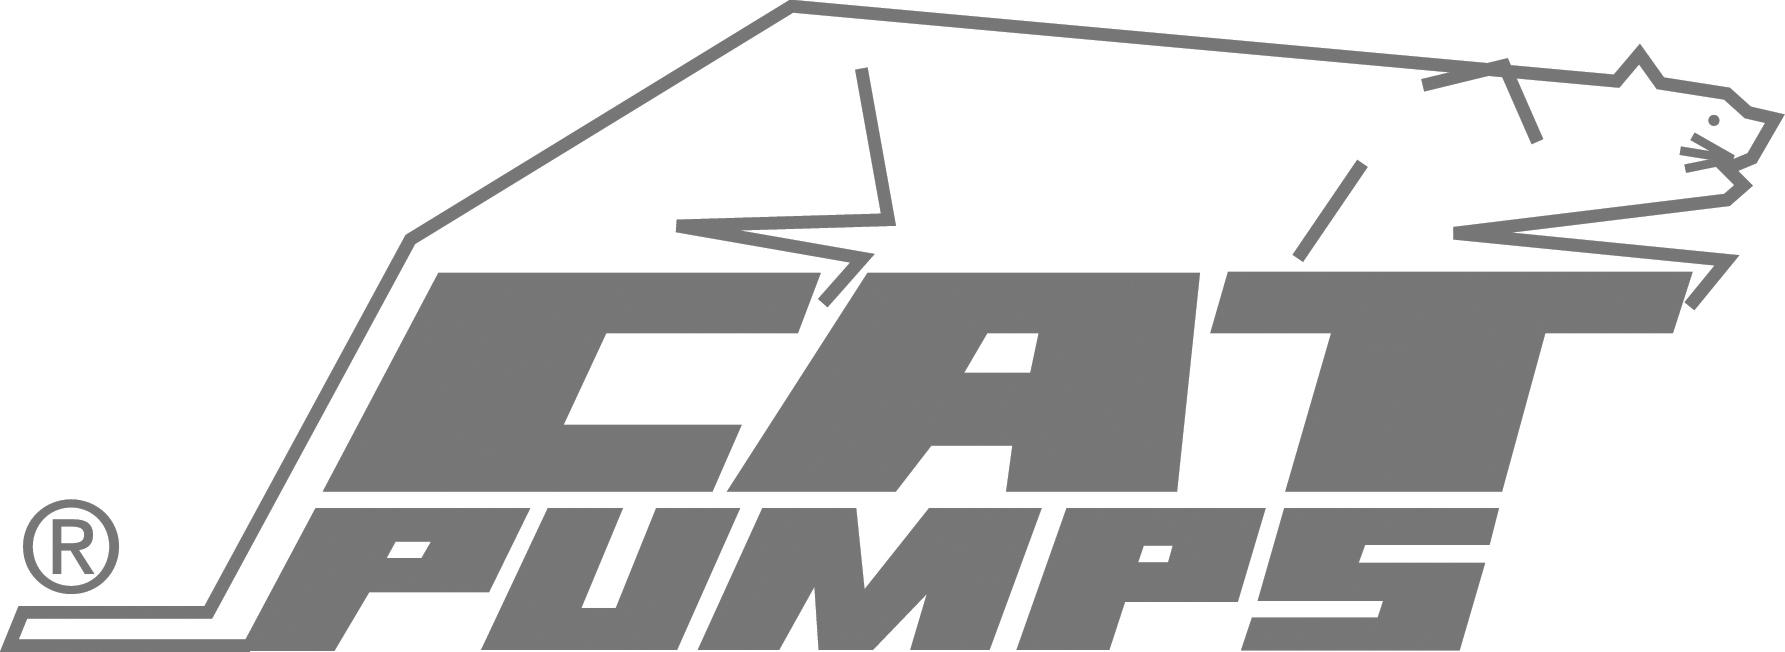 Cat Pumps bw.jpg